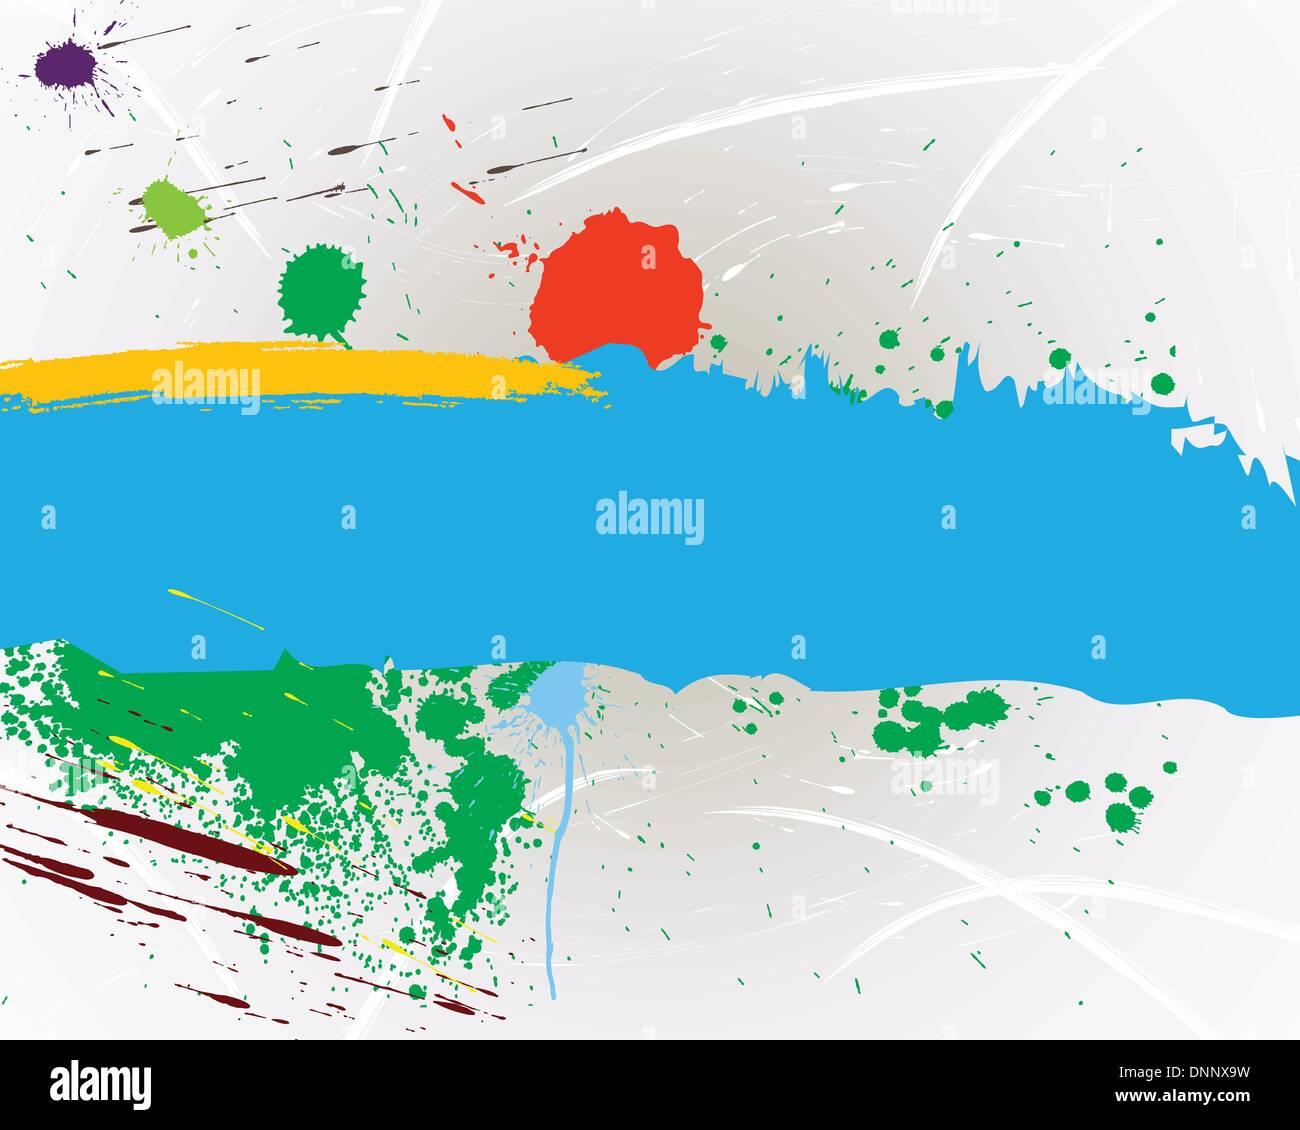 Resumen Antecedentes vector grunge para uso de diseño. Imagen De Stock